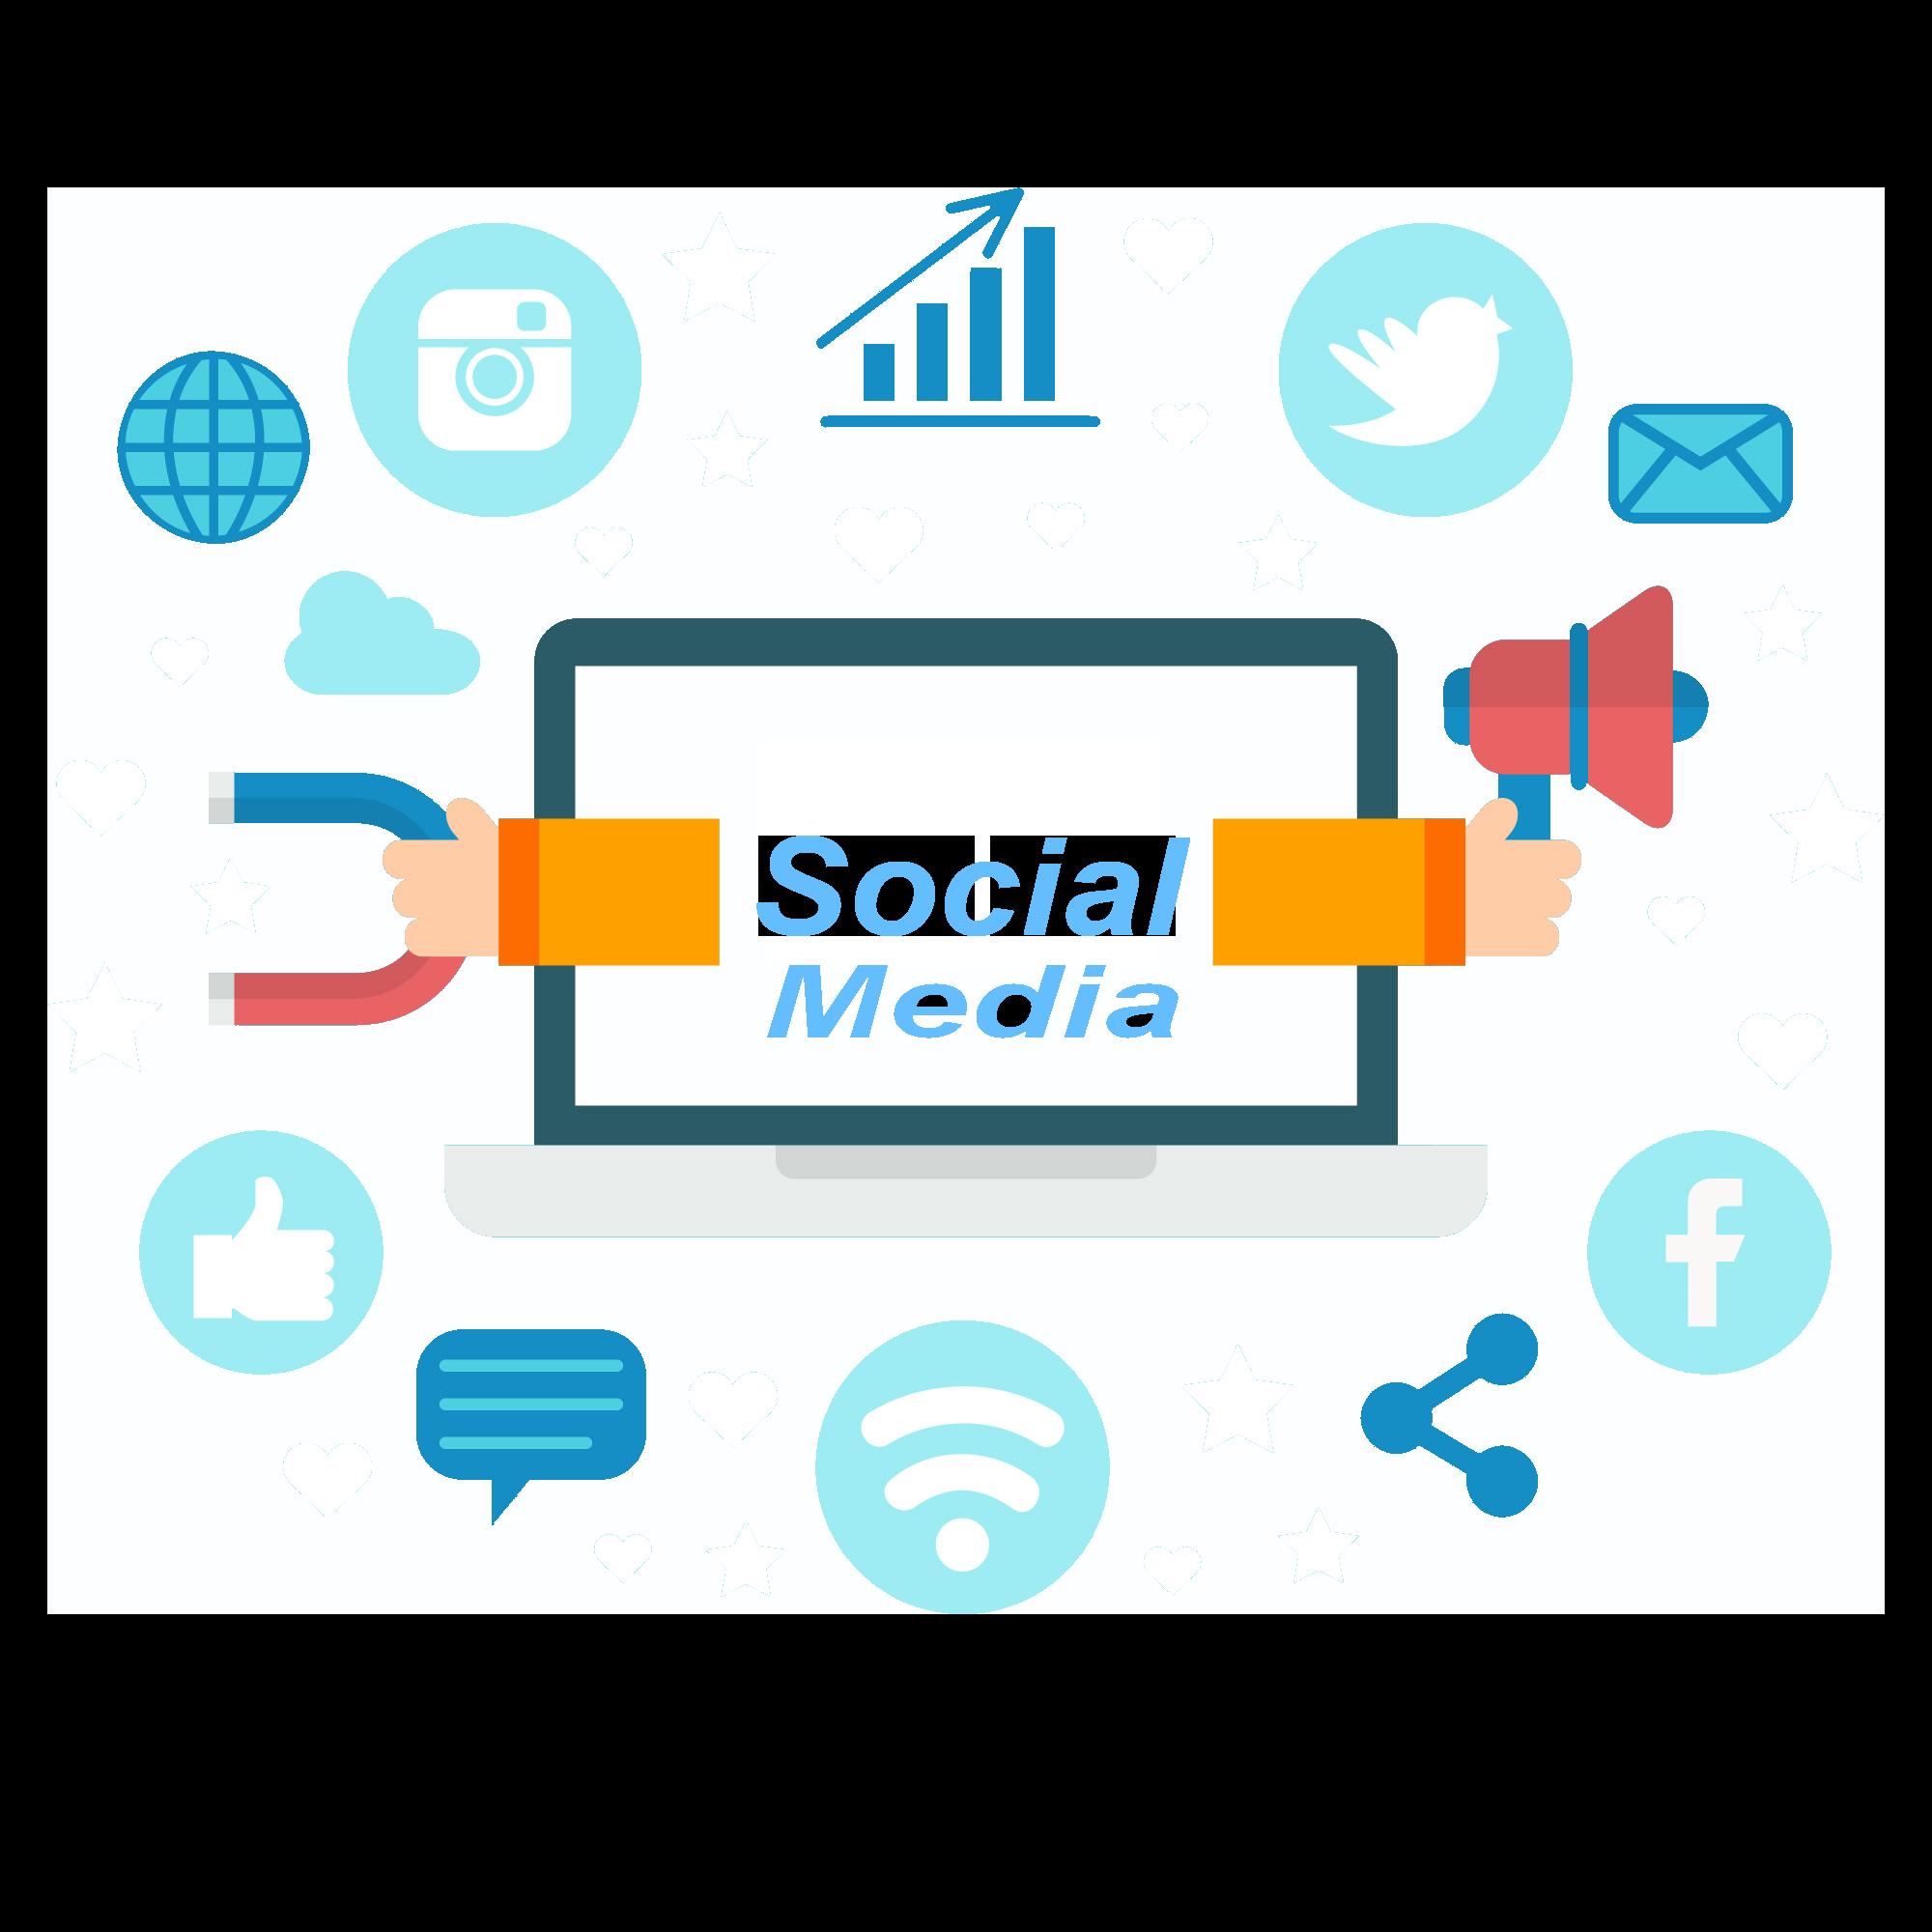 icon mit Social Media